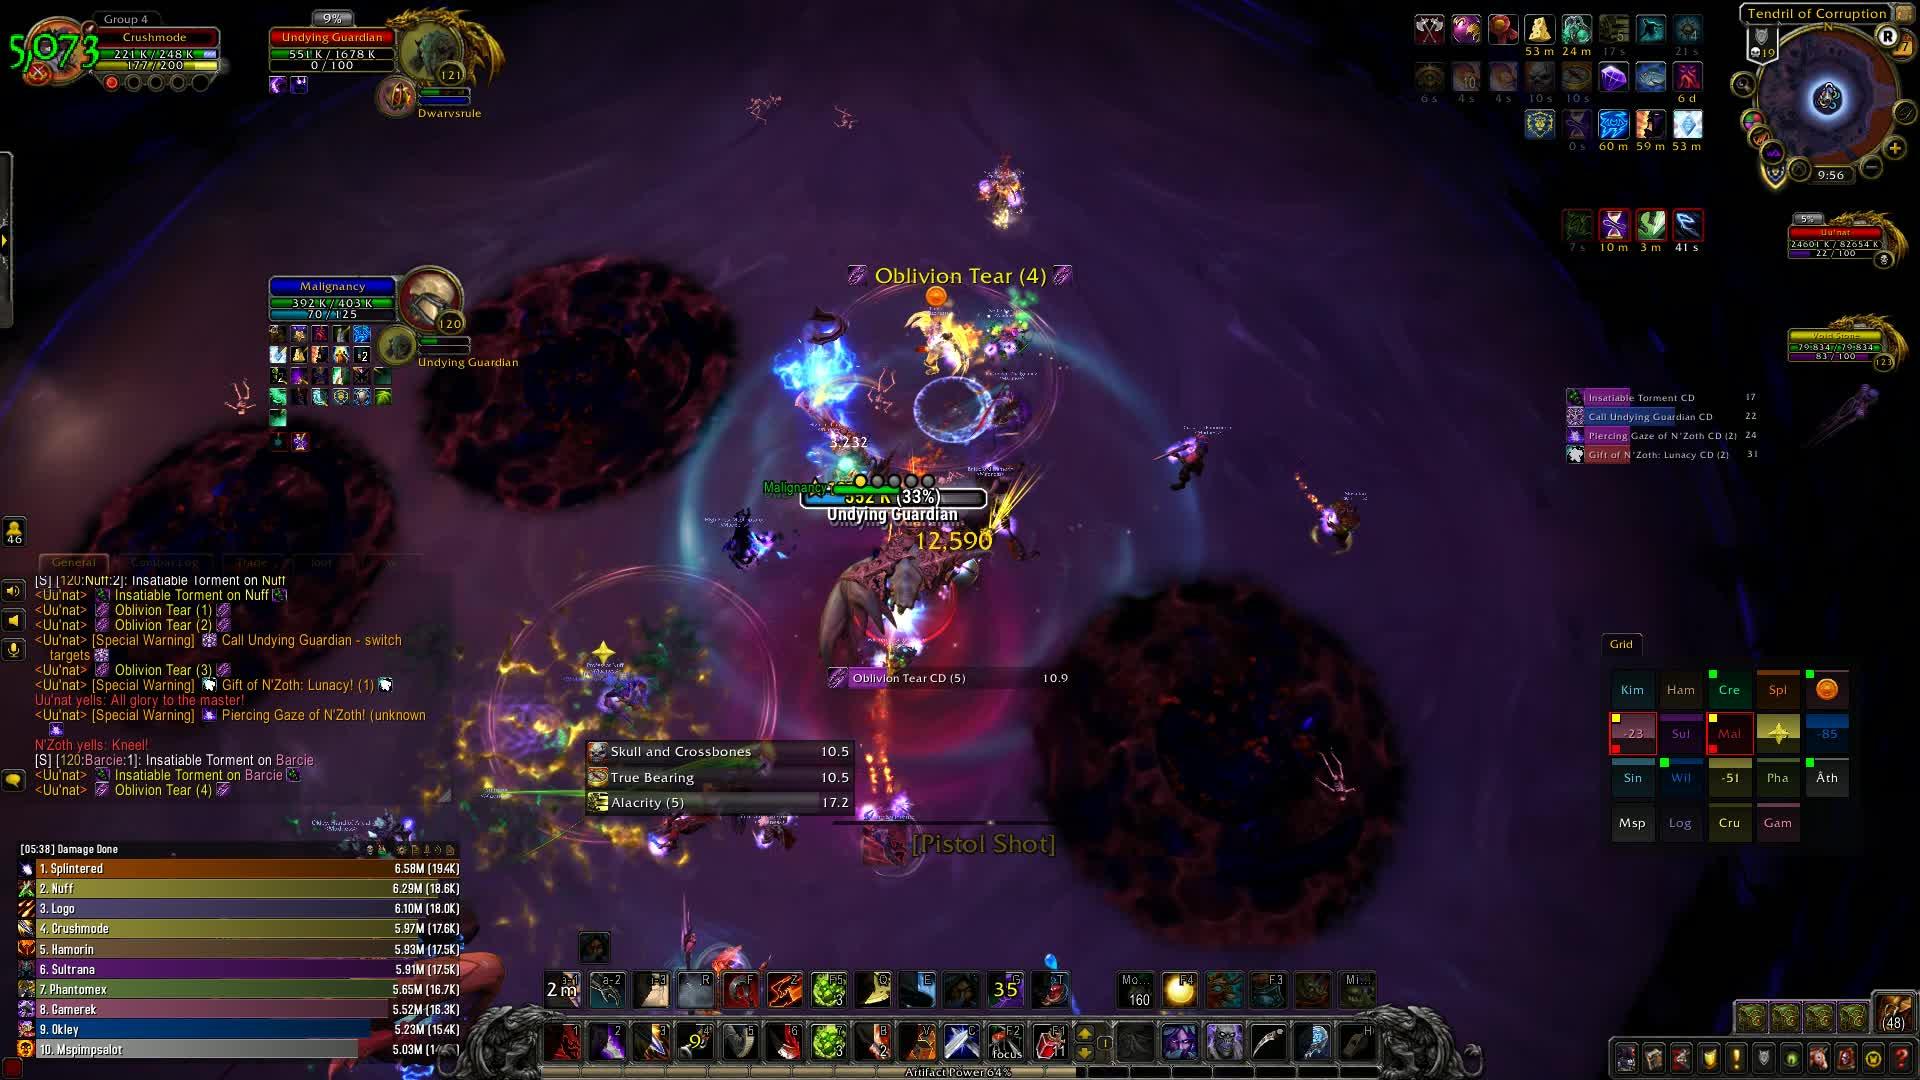 worldofwarcraft, World Of Warcraft 2019.04.17 - 21.56.36.02.DVR GIFs